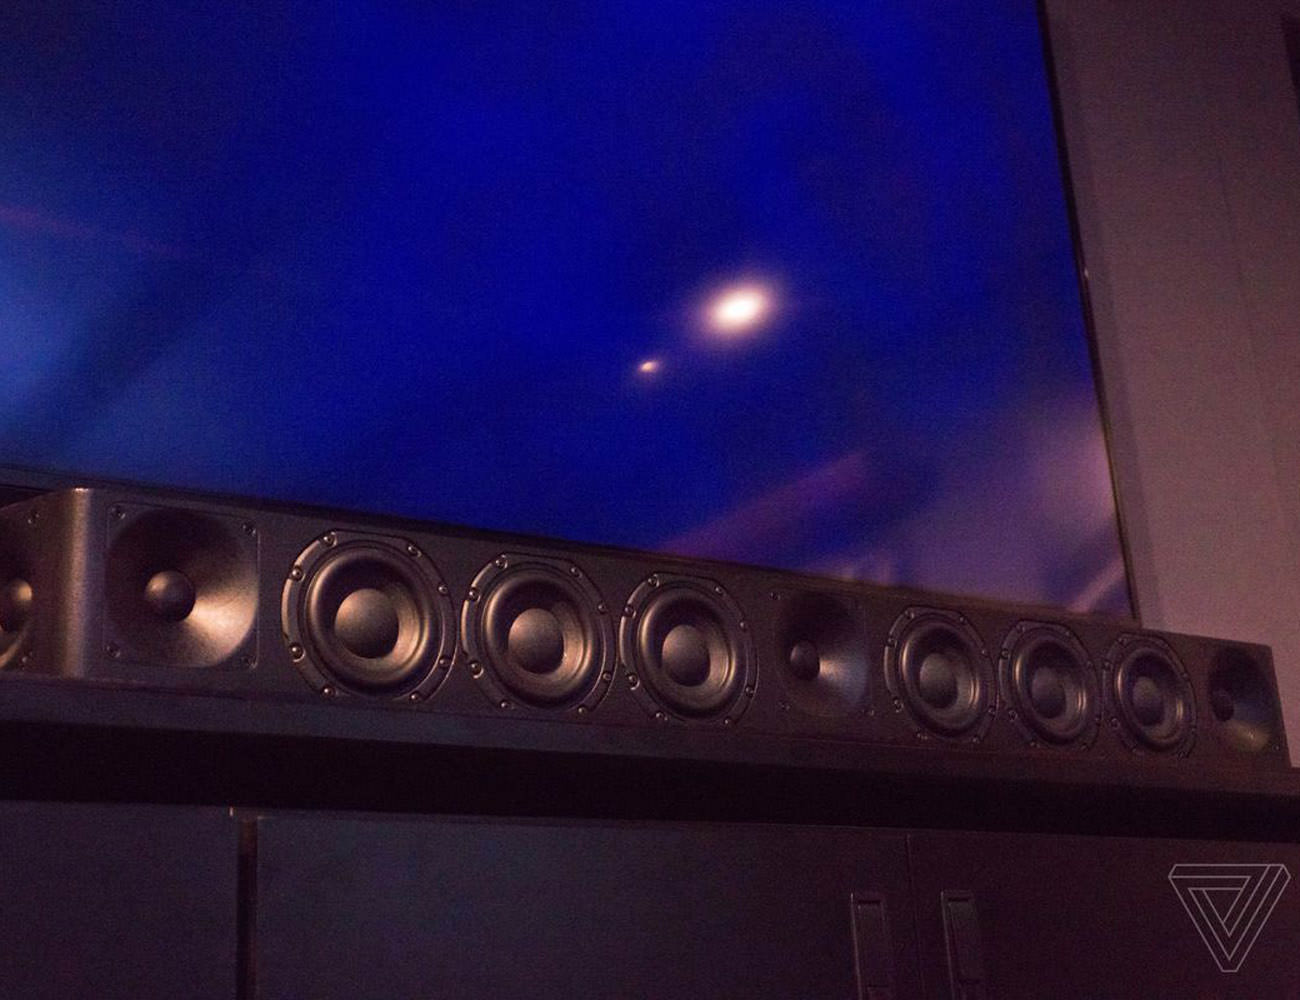 Sennheiser Ambeo 360 Degree Soundbar